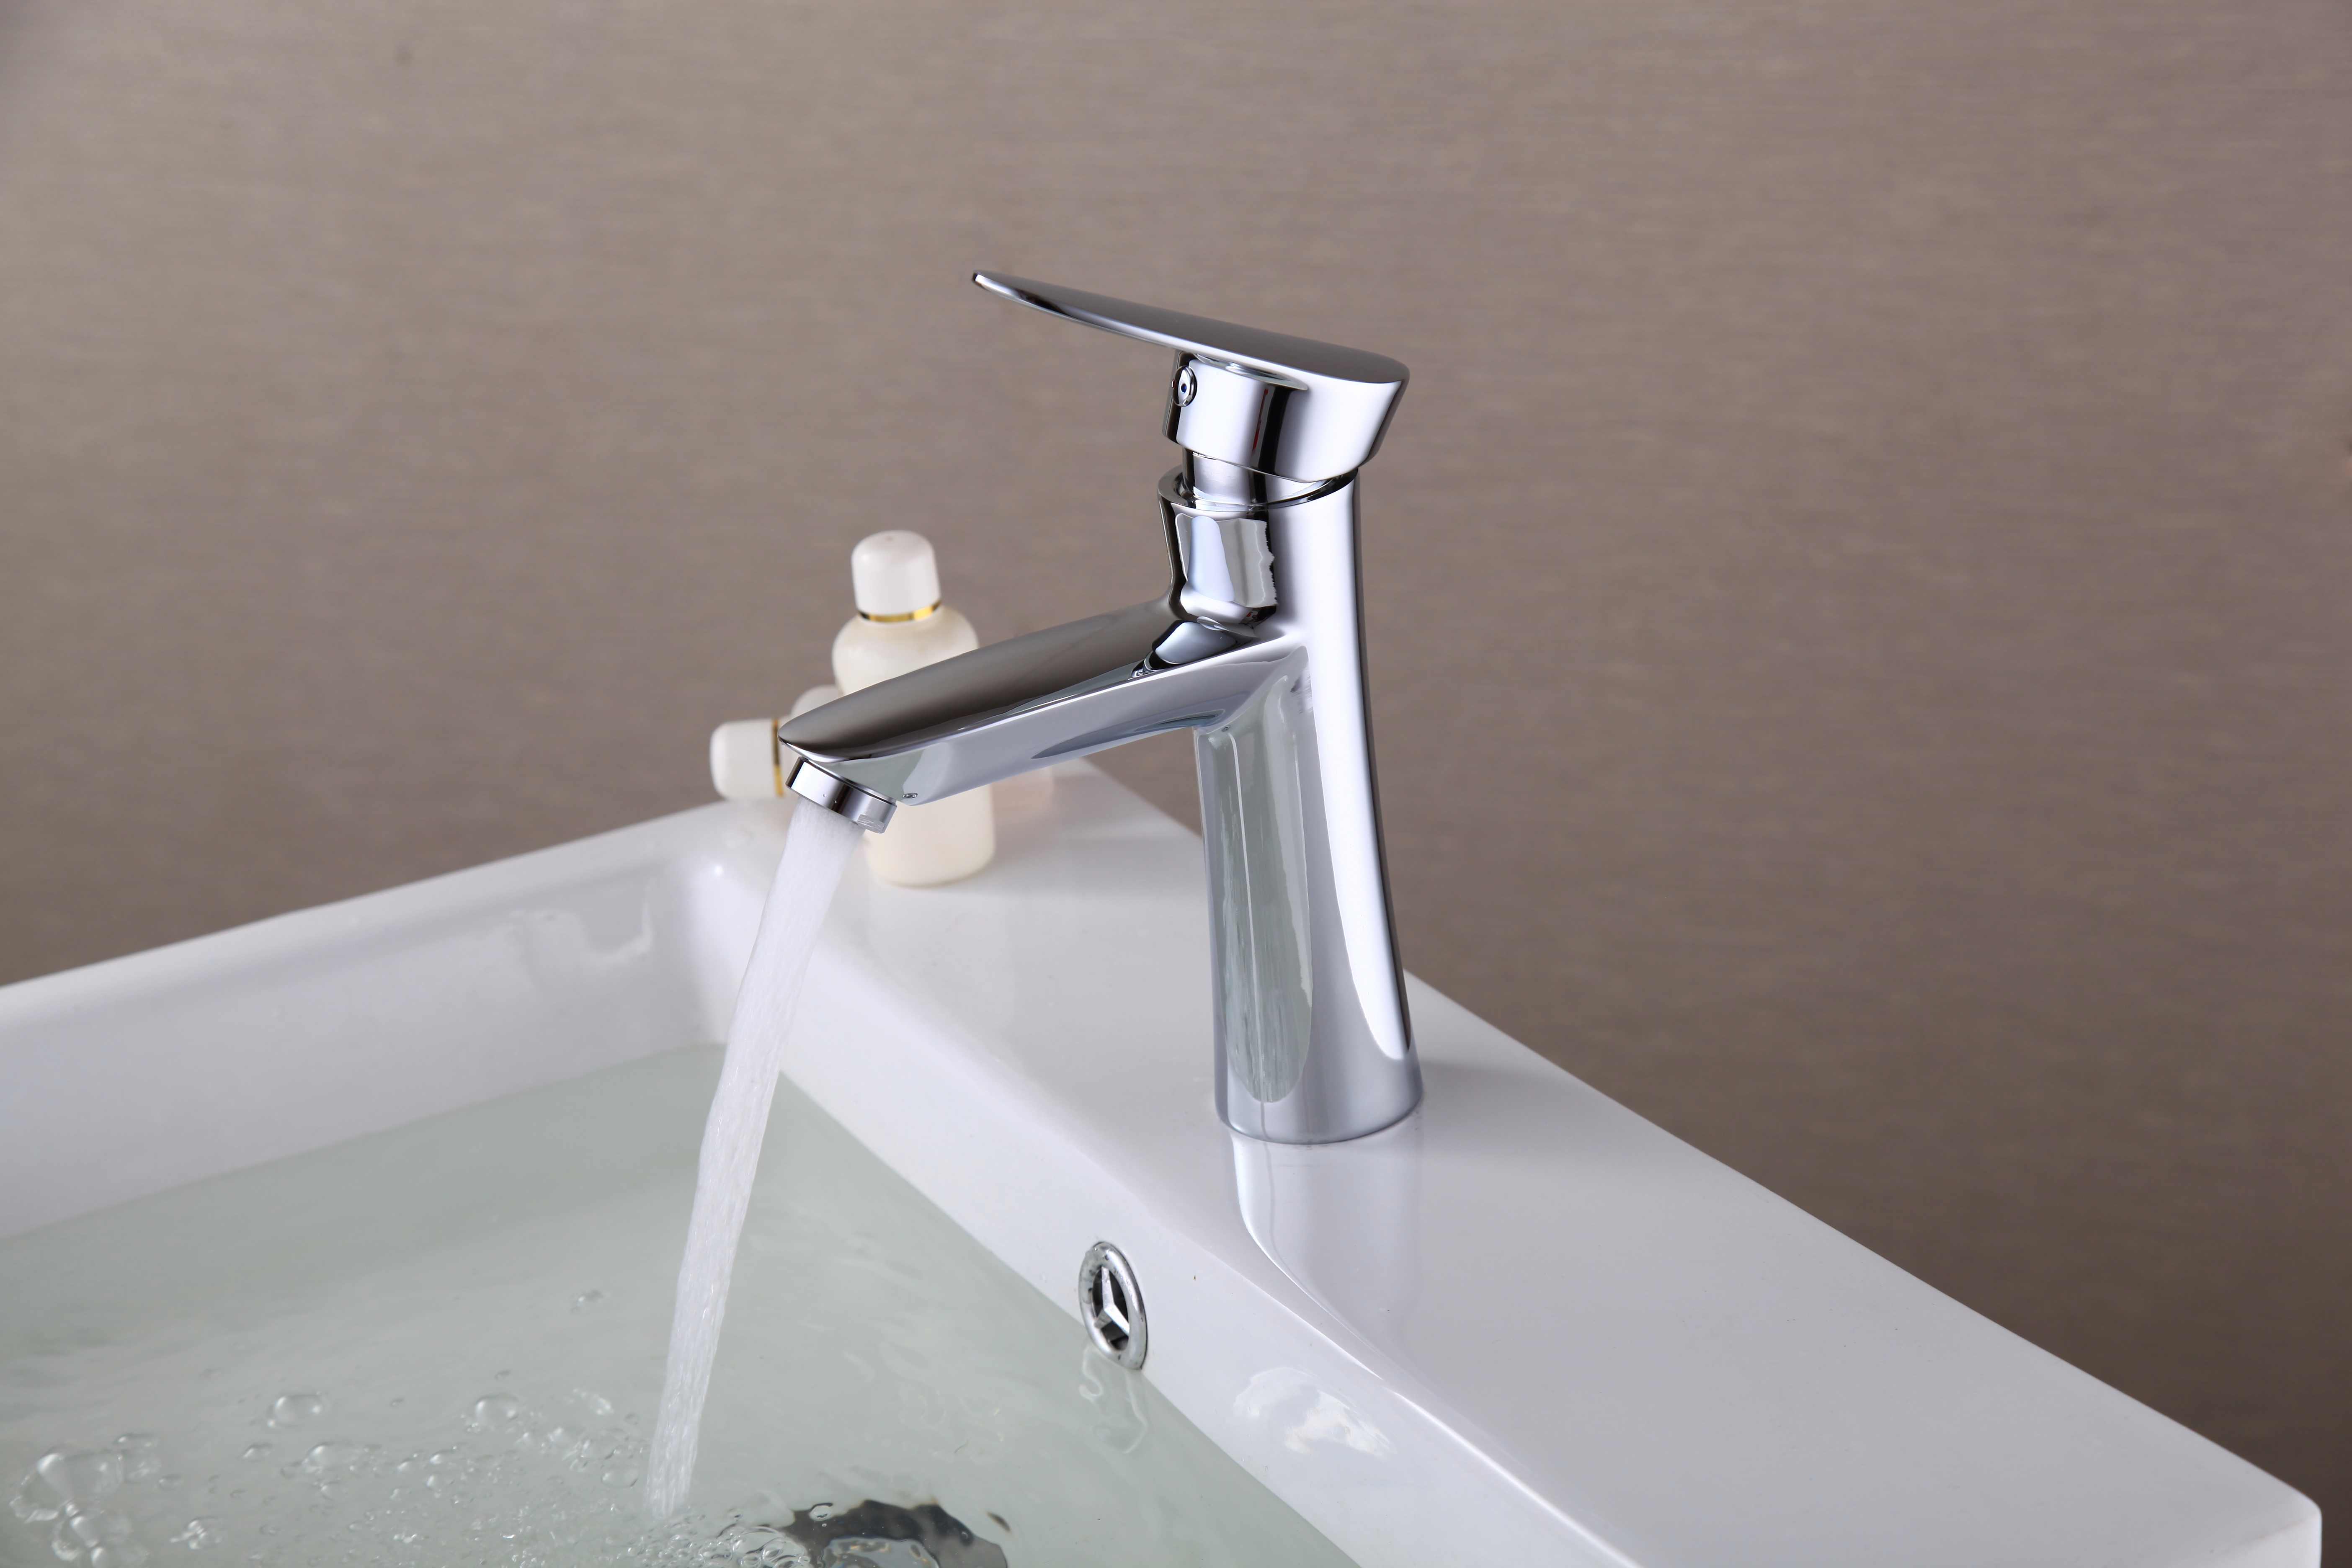 Bathroom Faucet Widespread Sink Mixer Tap Oil Rubbed